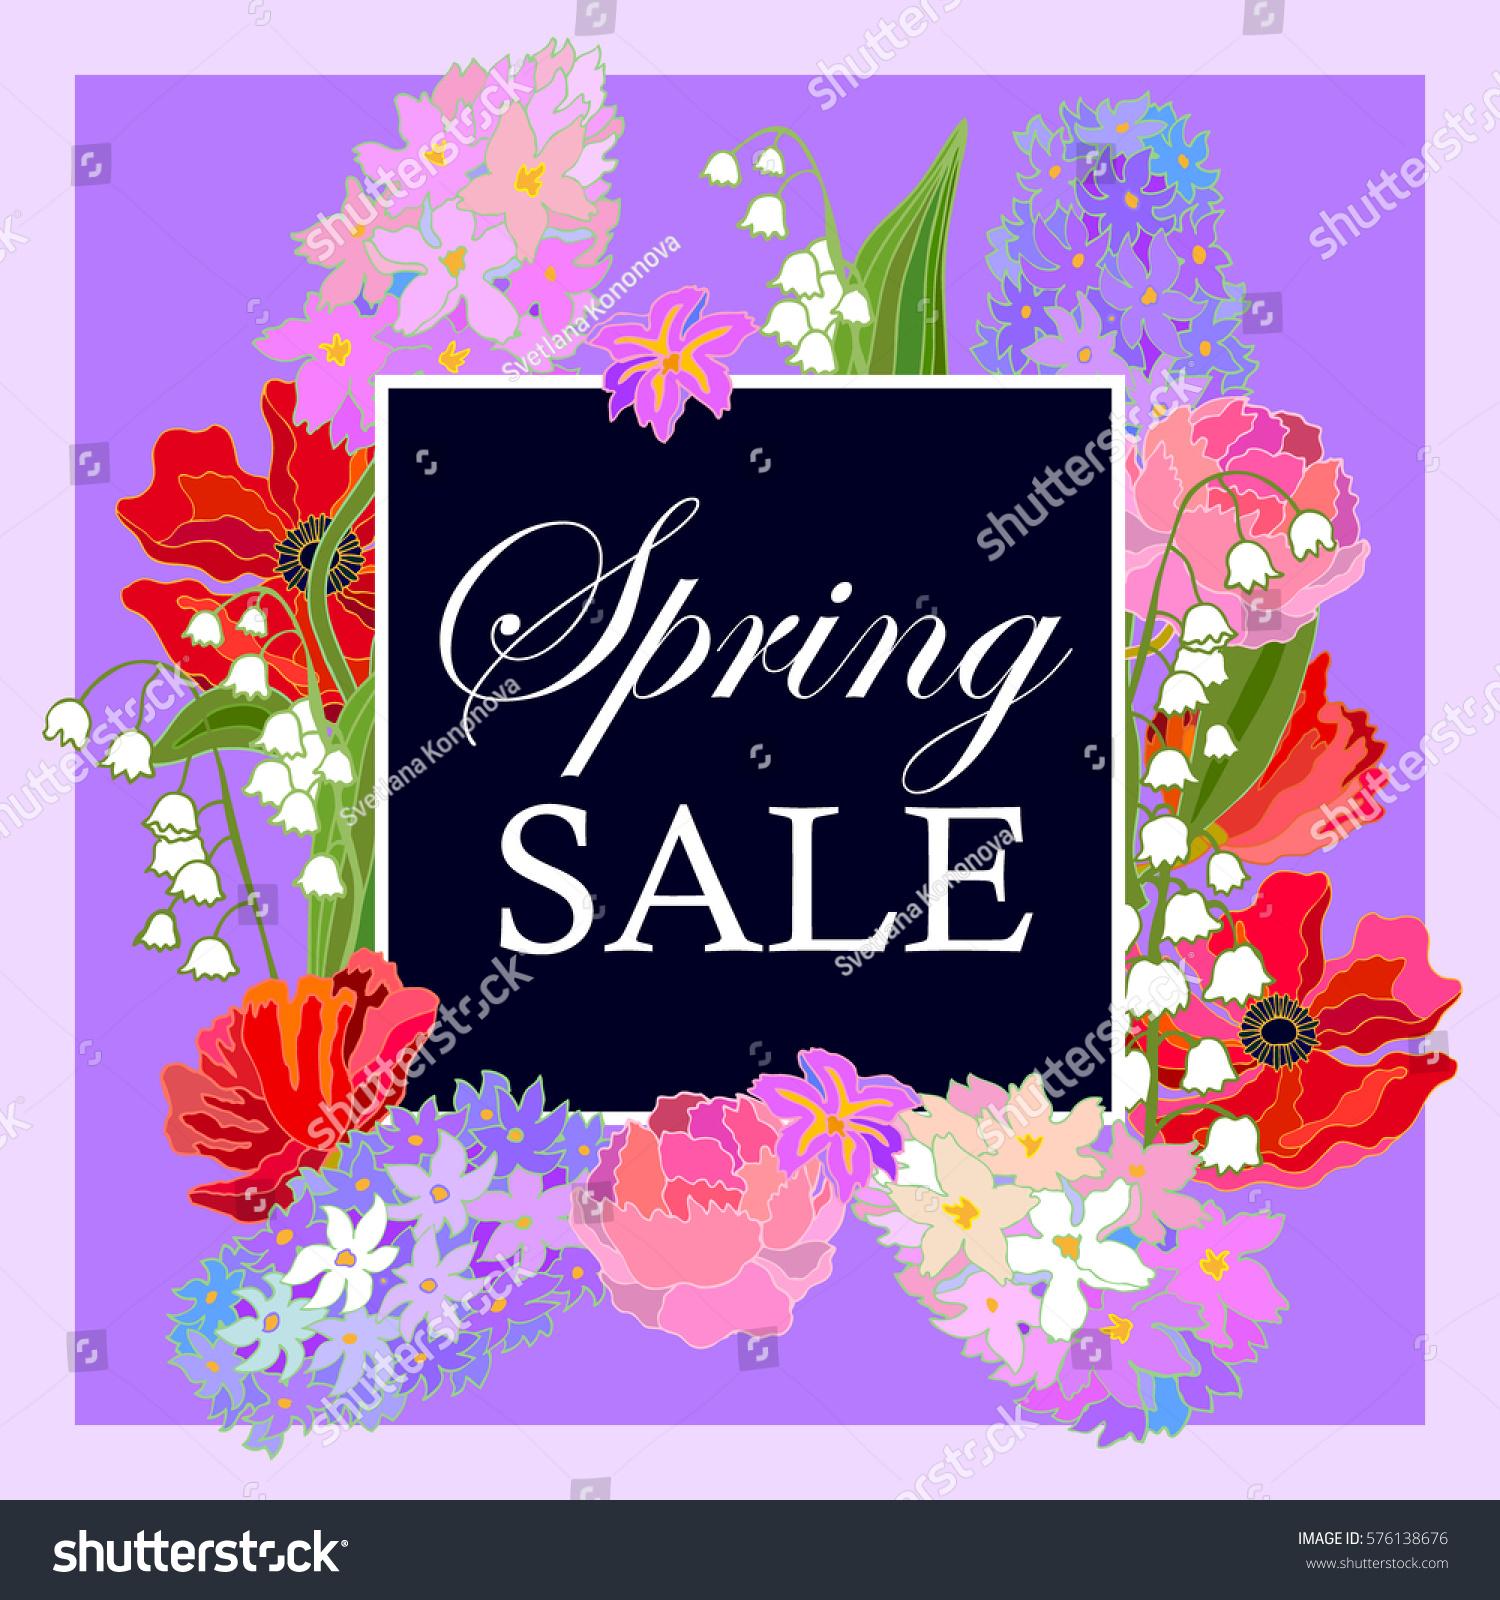 Blooming Spring Flowers Vintage Cards Hyacints Stock Vector Royalty